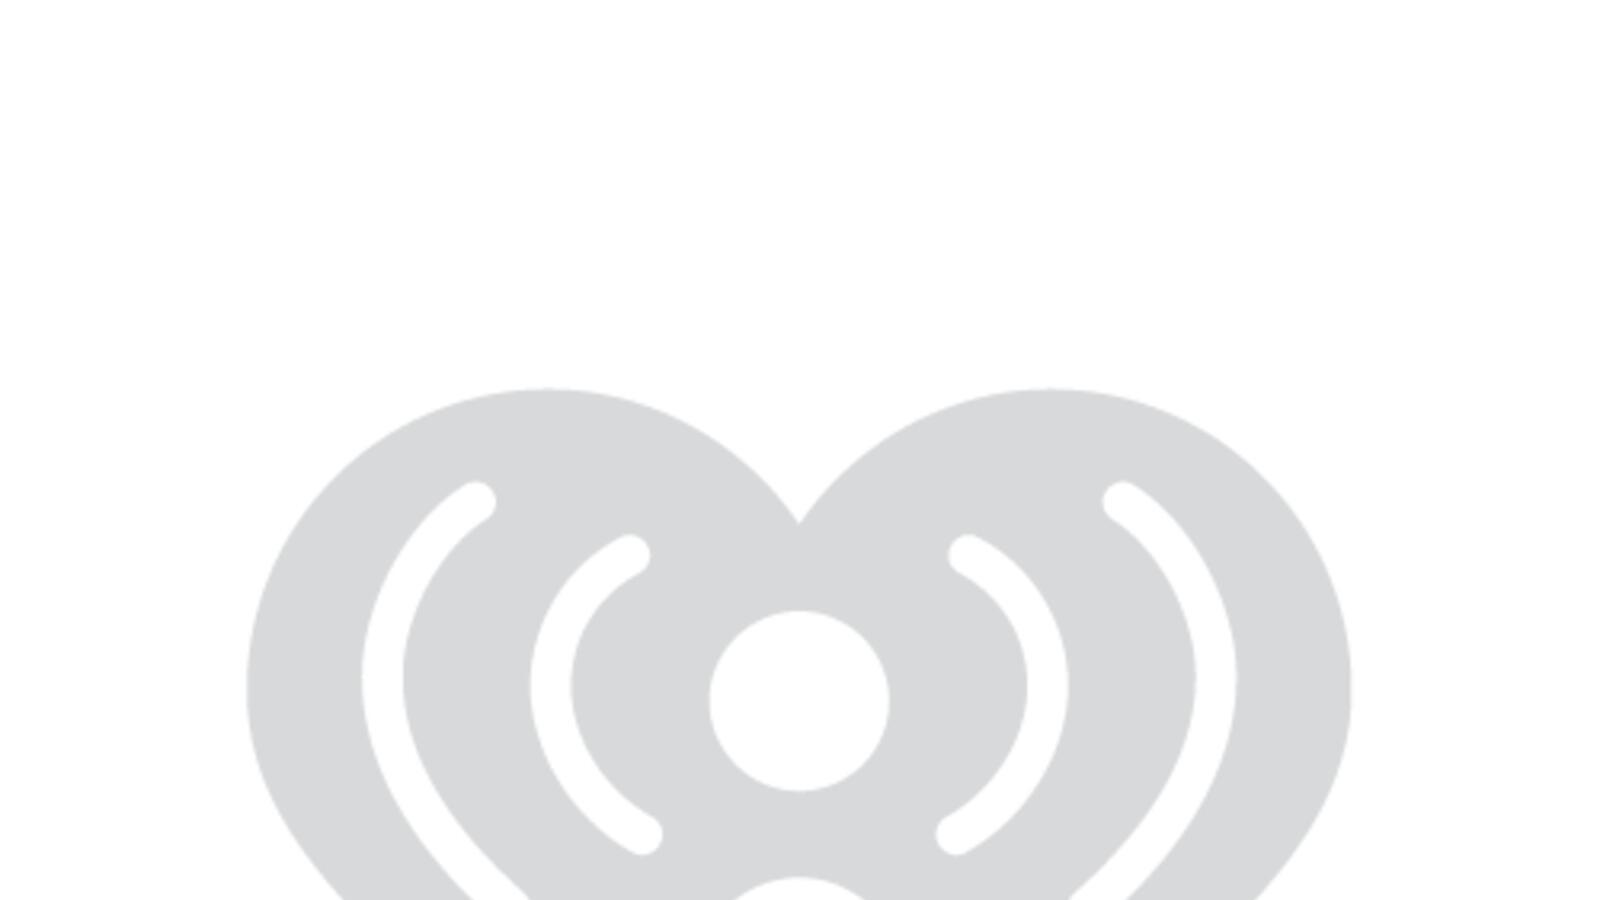 Rod Arquette Show Daily Rundown - Wednesday, September 22, 2021